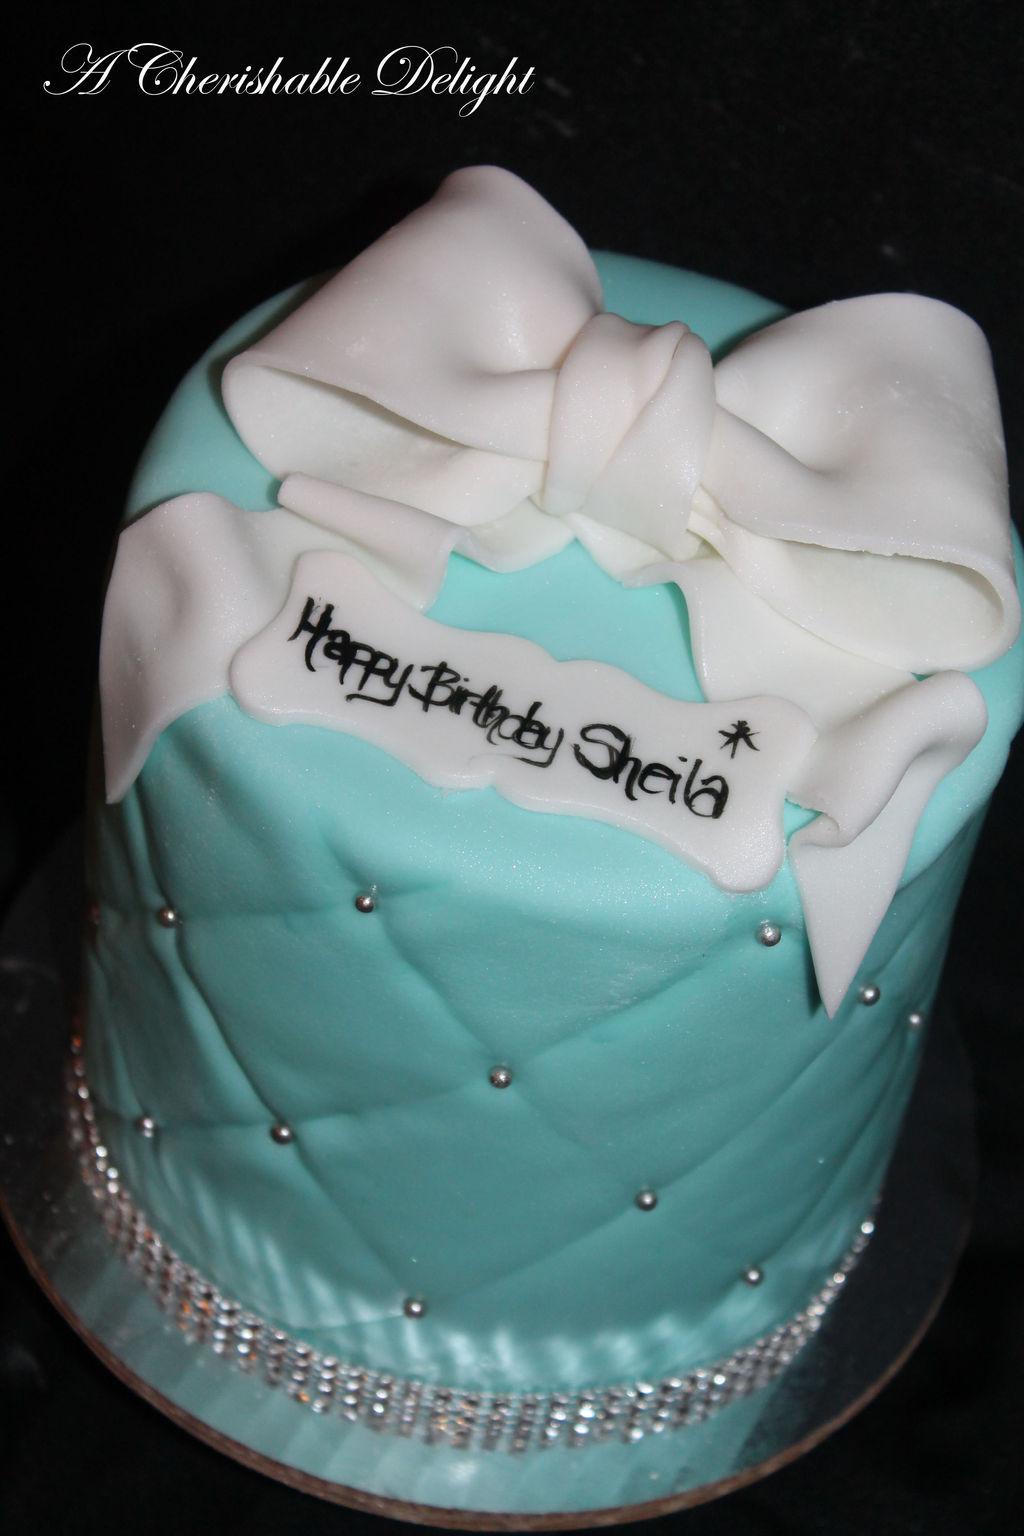 A Cherishable Delight Cakes Cupcakes Cookies Wixcom